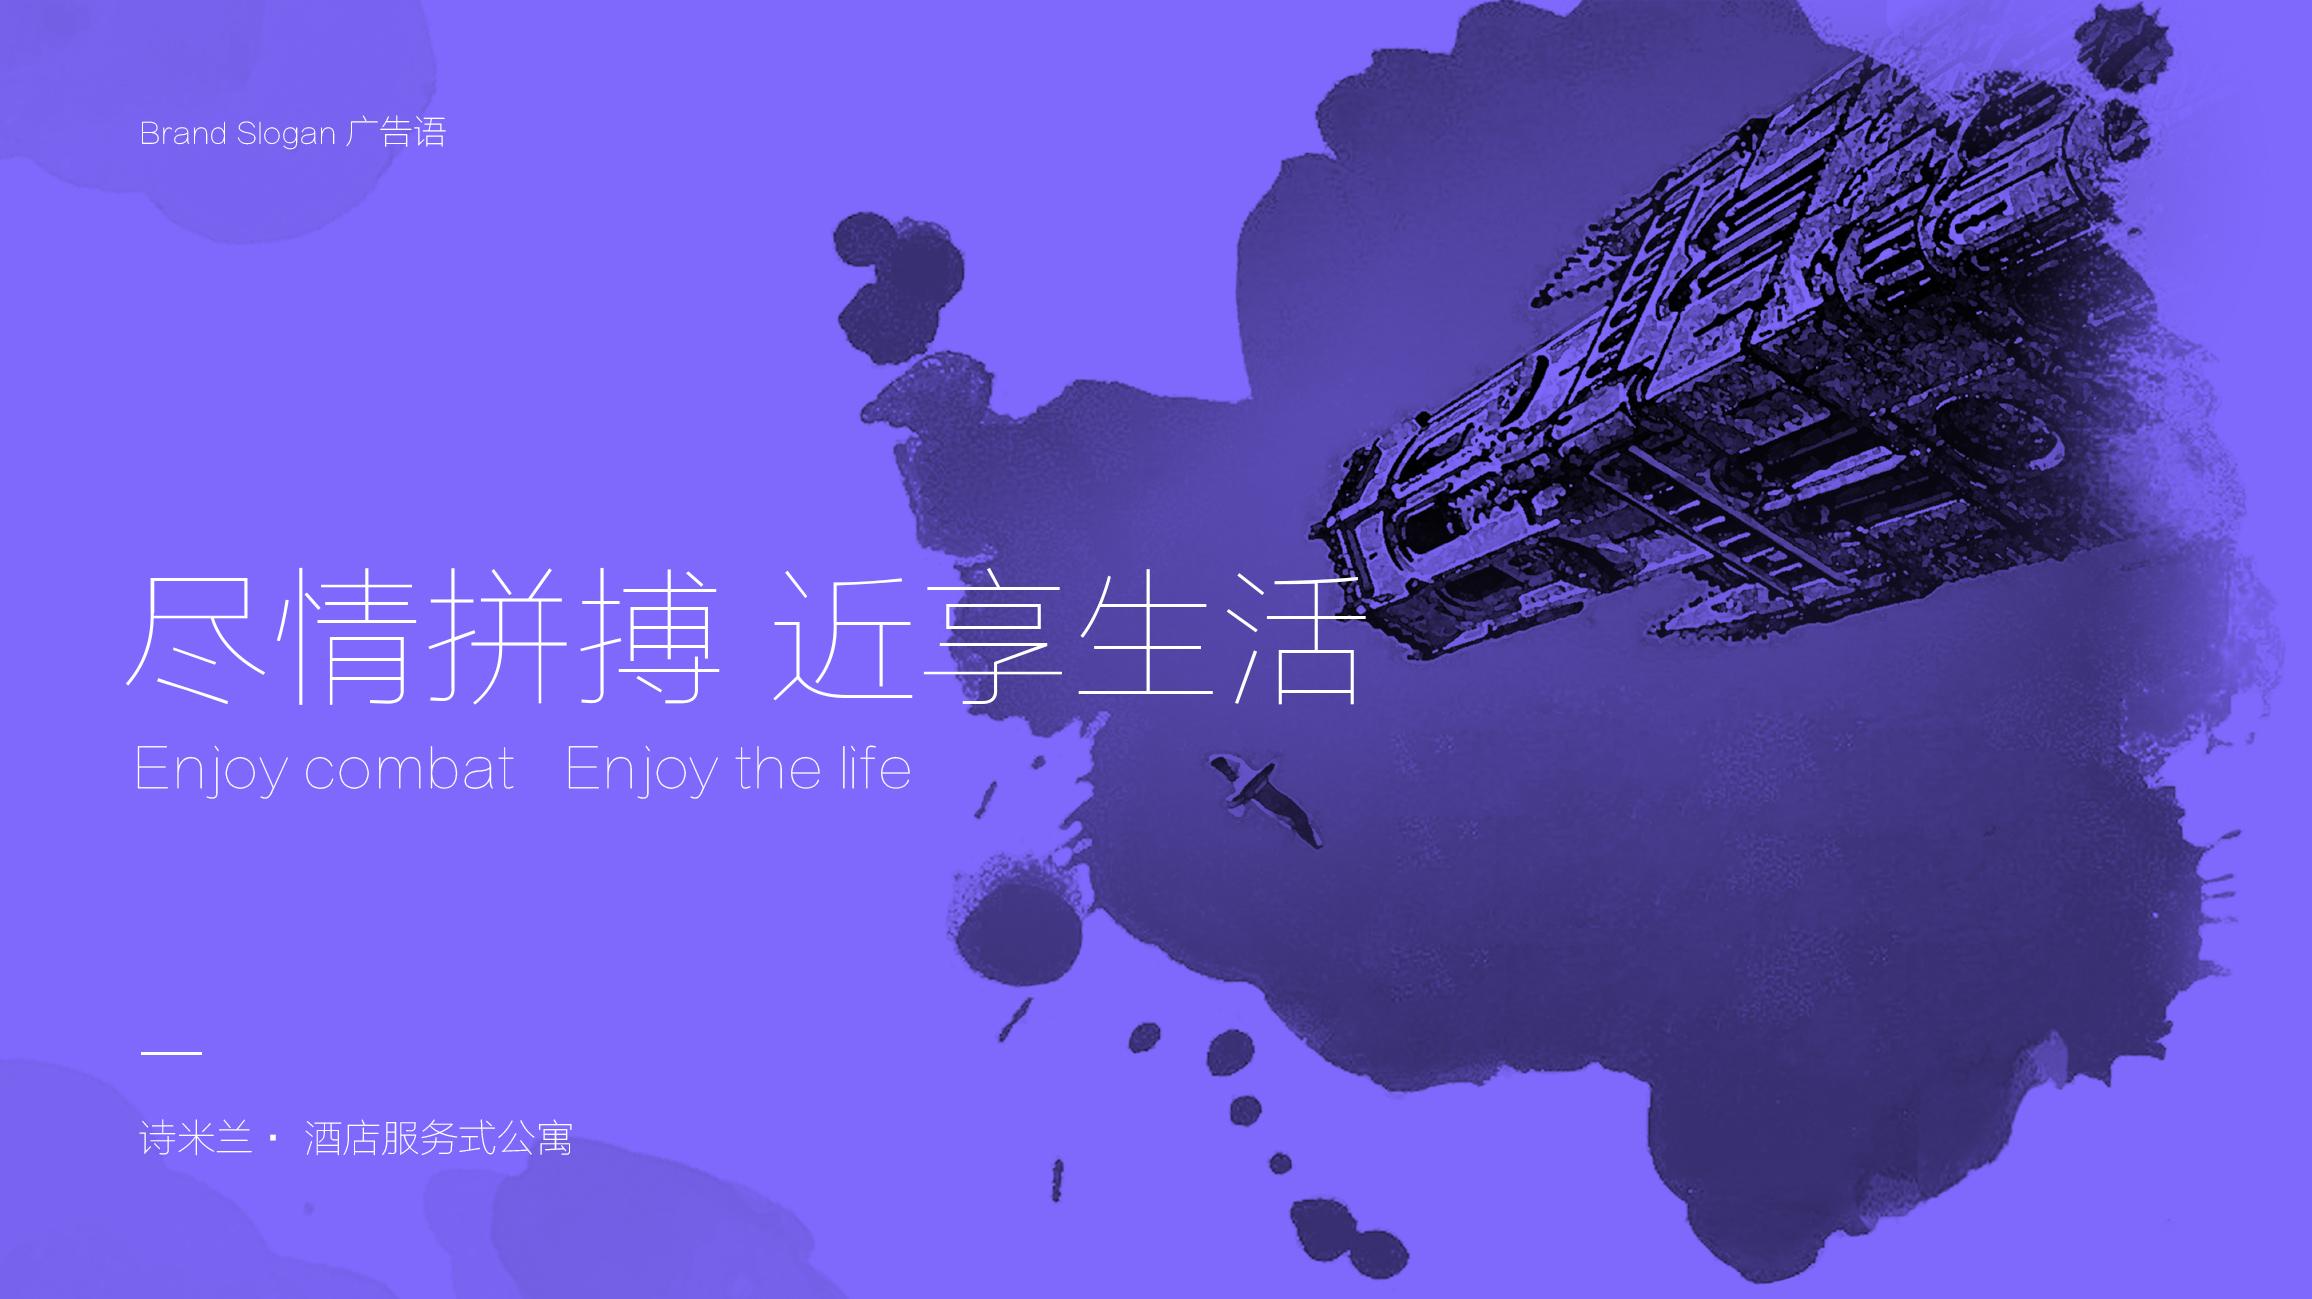 杭州品牌策划一酒店品牌策划